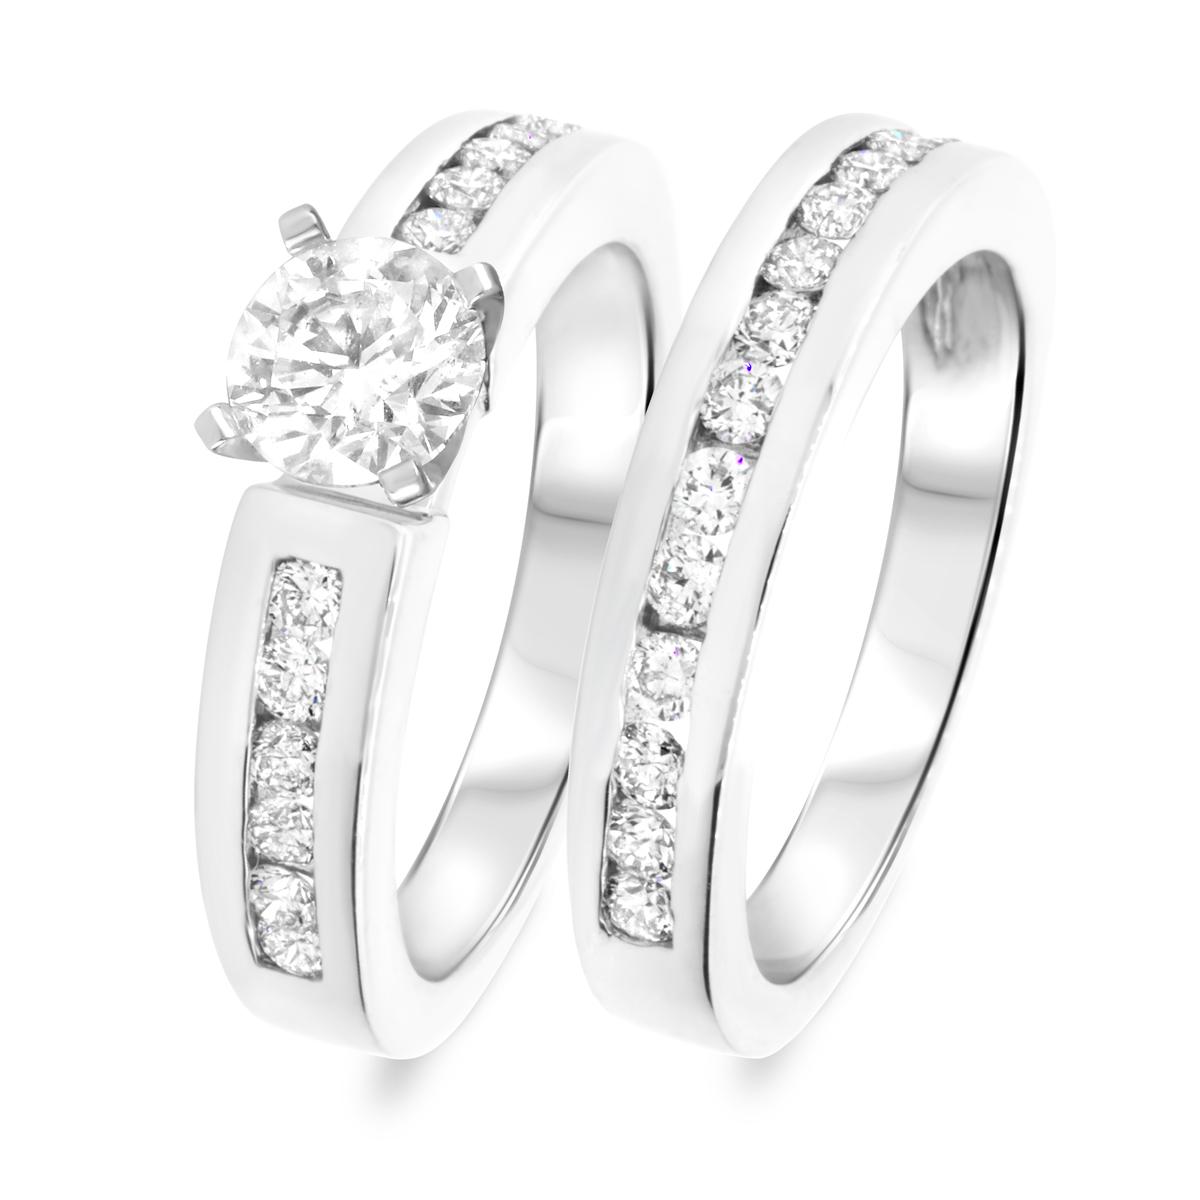 1 7/8 CT. T.W. Diamond Women's Bridal Wedding Ring Set 10K White Gold